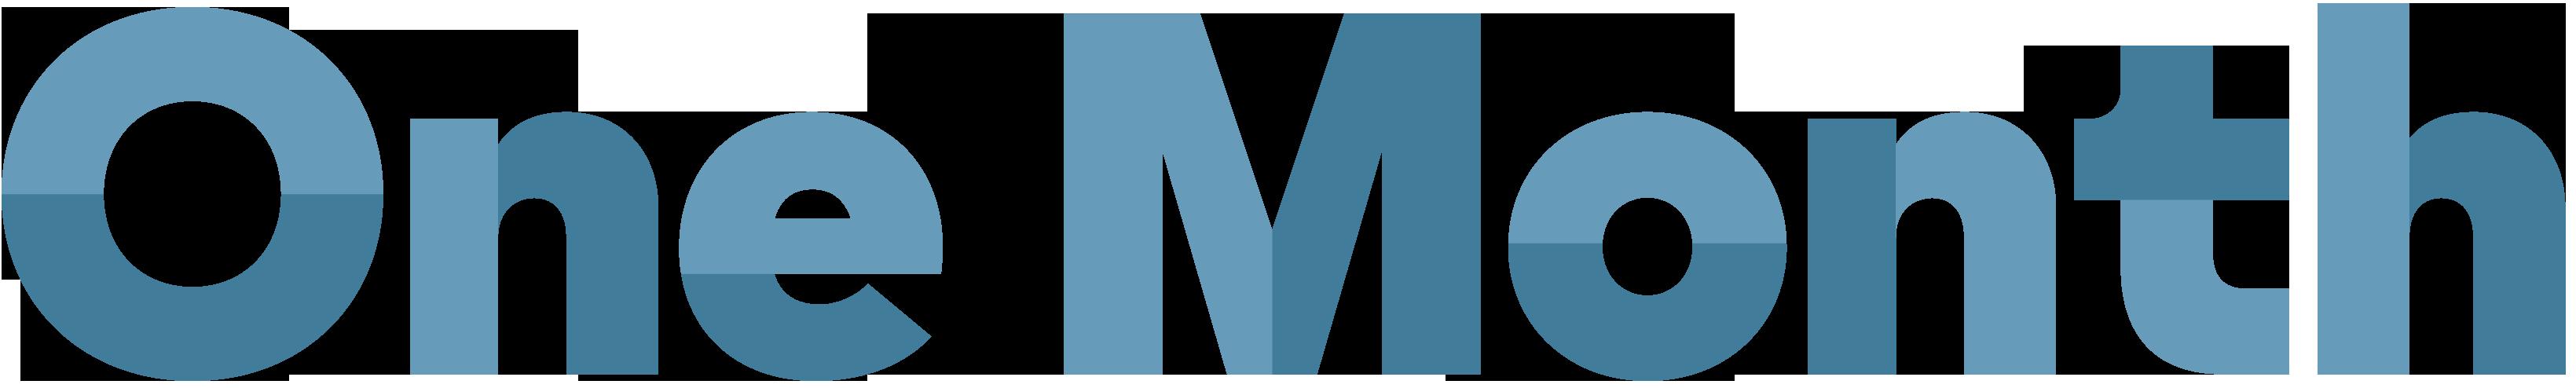 One-Month-Brand_Logo-Blue